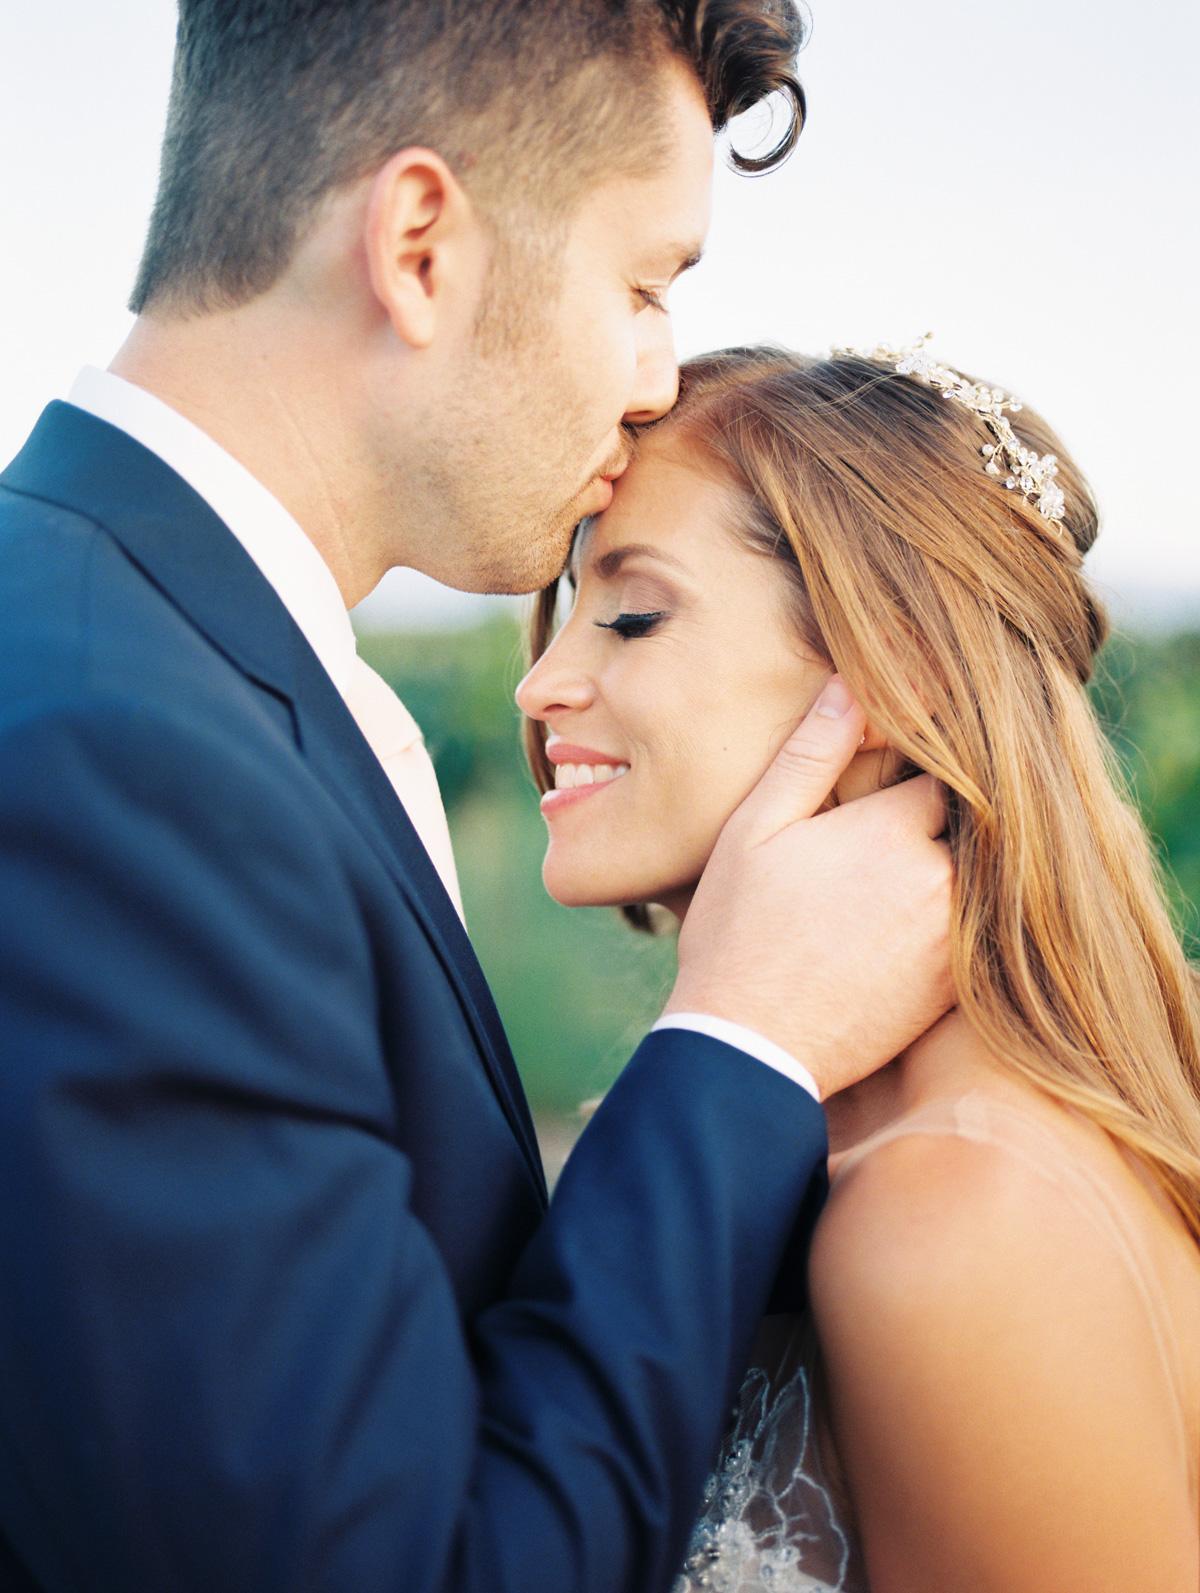 Groom kissing bride's head, bride smiling |Harrison & Jocelyne's gorgeous Temecula wedding day at Wiens Family Cellars captured by Temecula wedding photographers Betsy & John